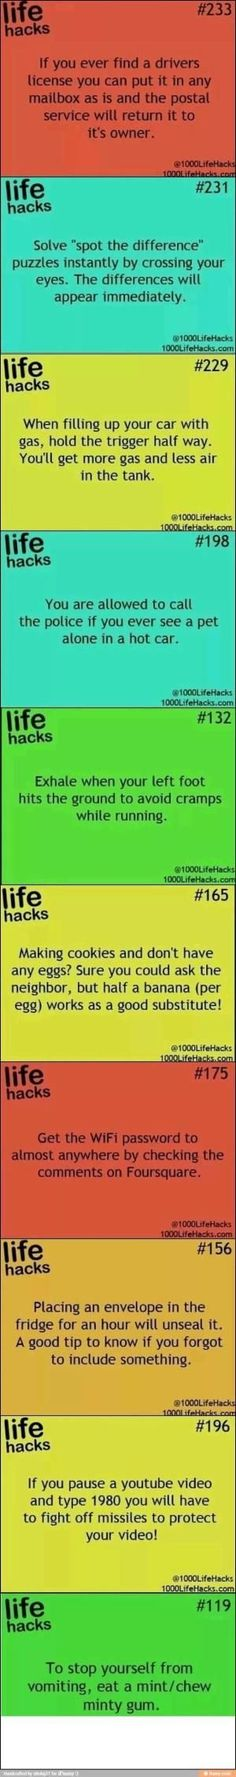 Life hacks by ellen